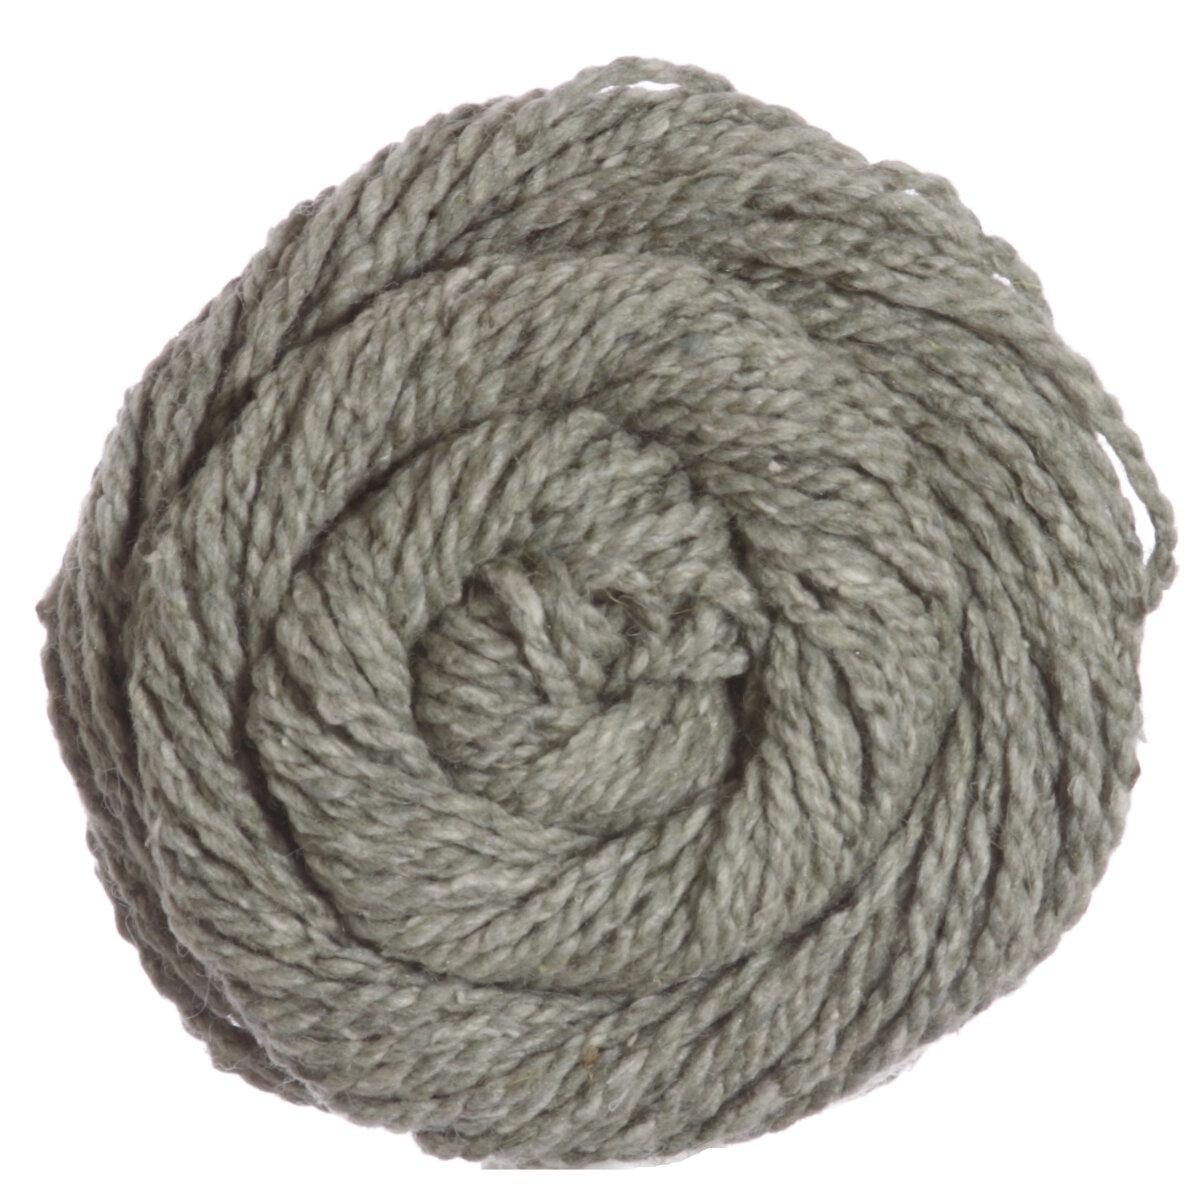 Cascade Tivoli Yarn - 01 Dove at Jimmy Beans Wool